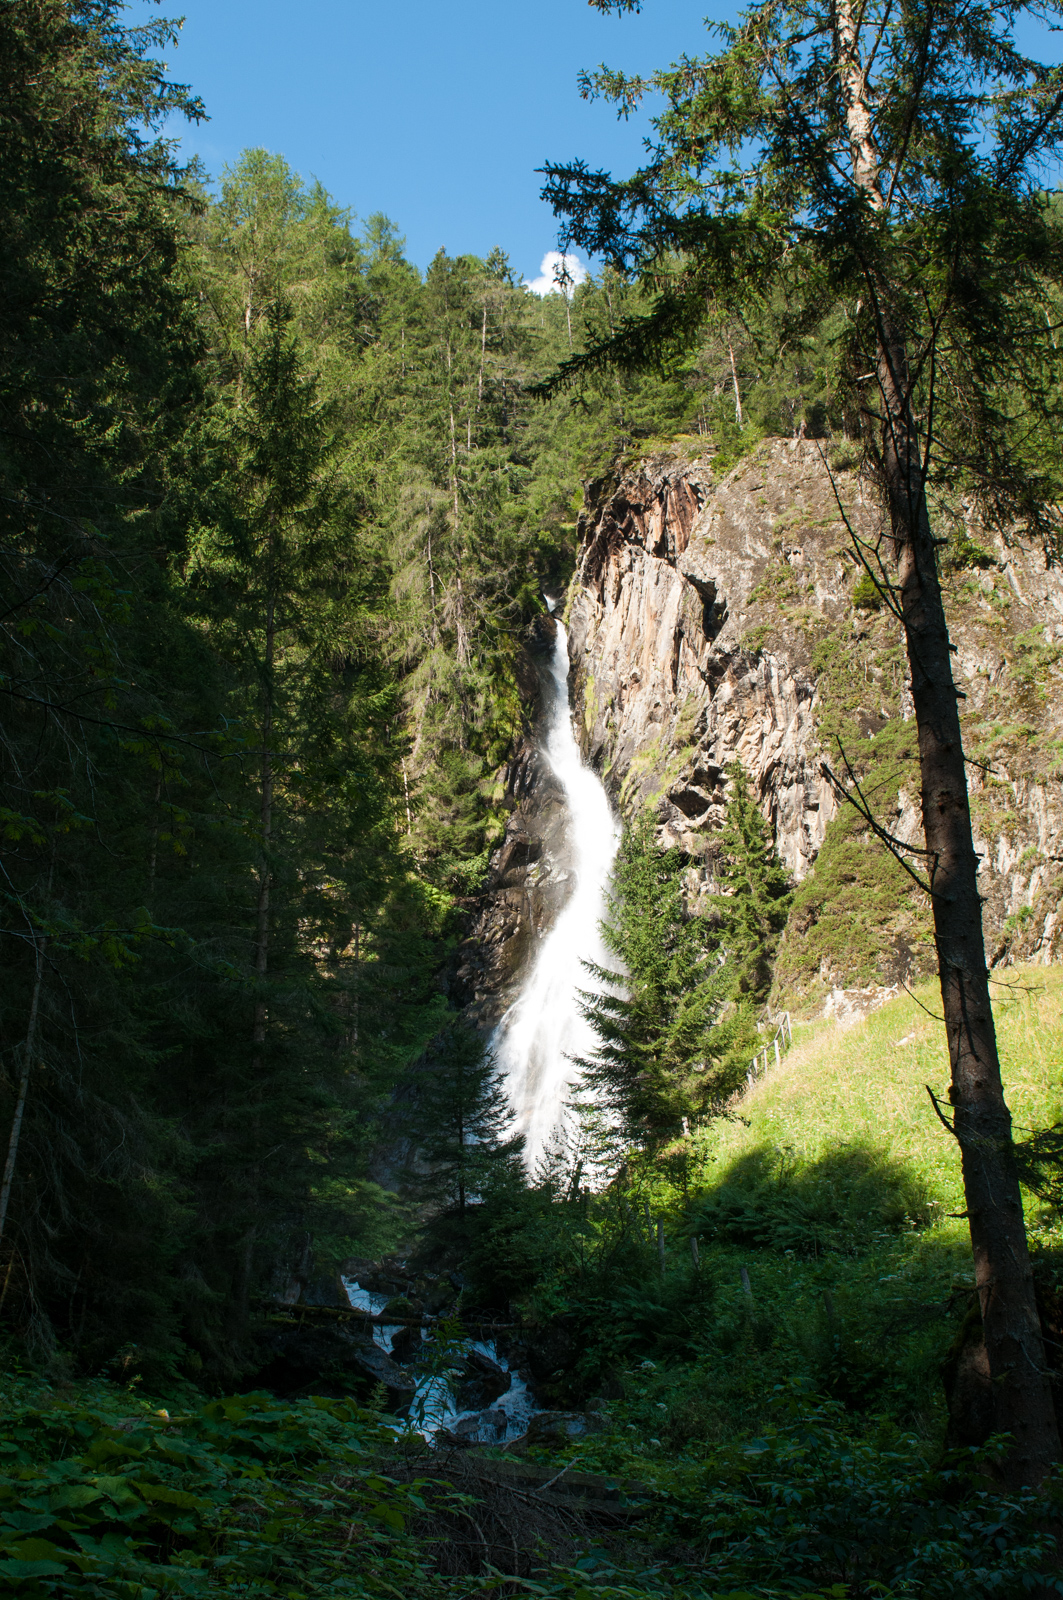 Waterfall in Austria: Tumpener wasserfall